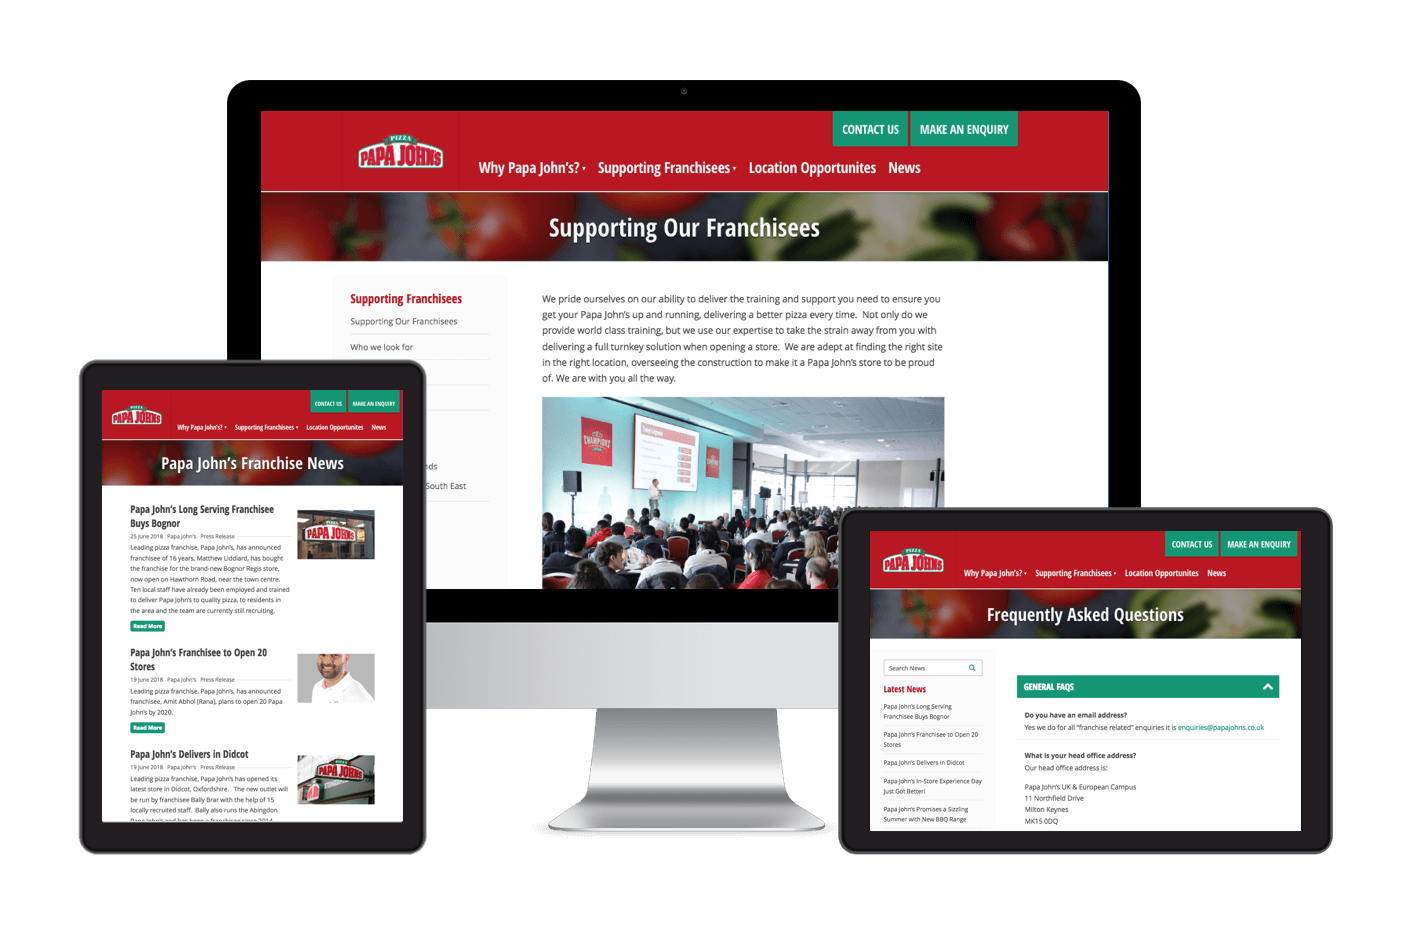 Papa John's responsive website design